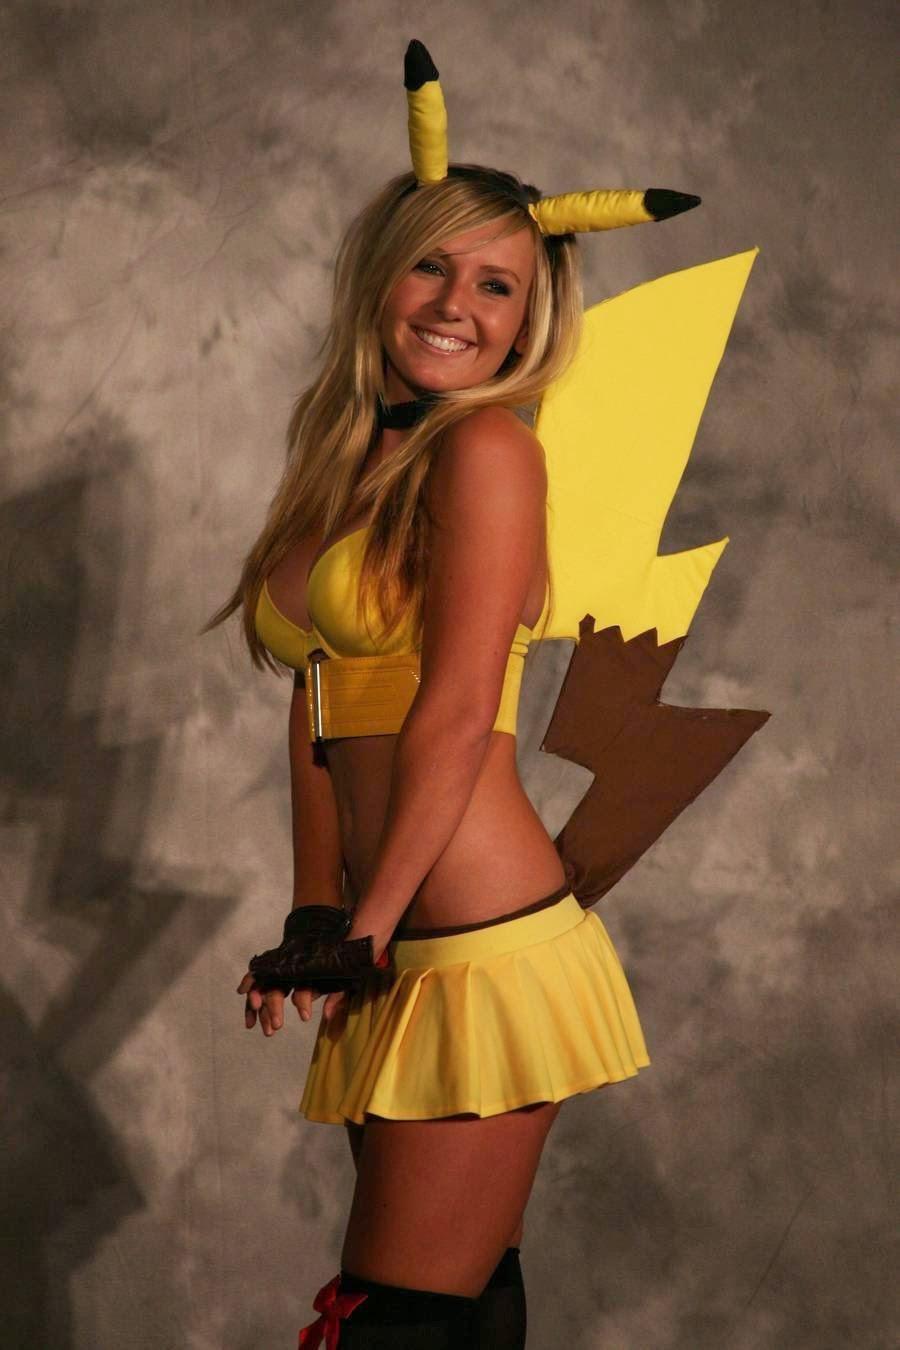 Jessica Nigri cosplays de Pikachu